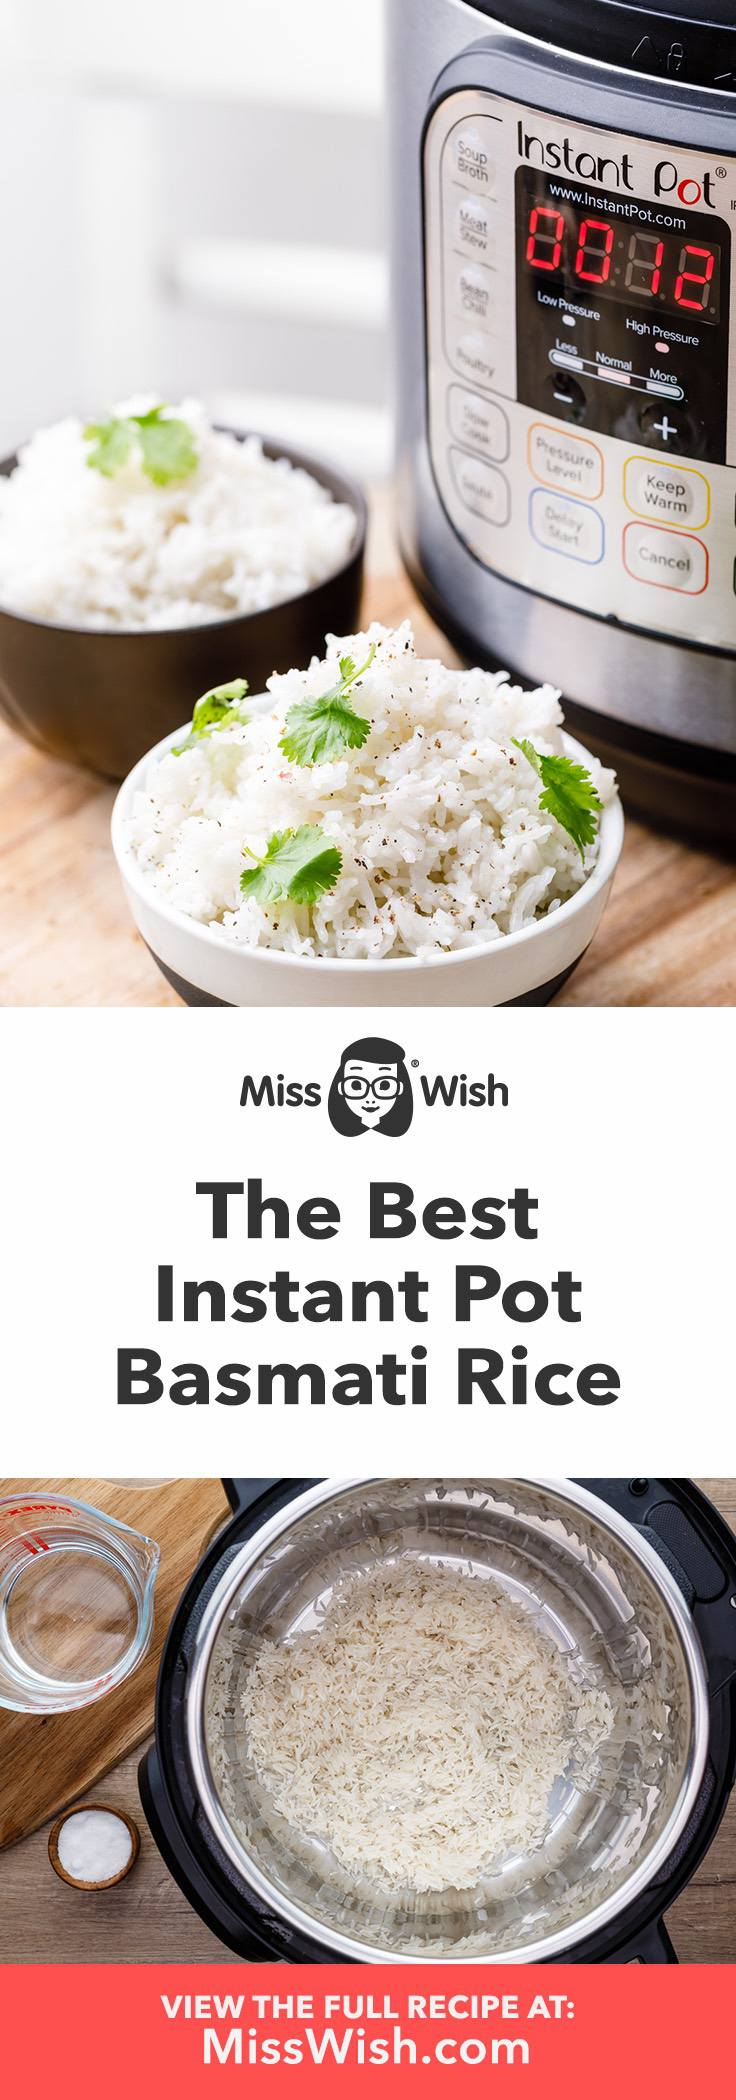 Easy Instant Pot Basmati Rice